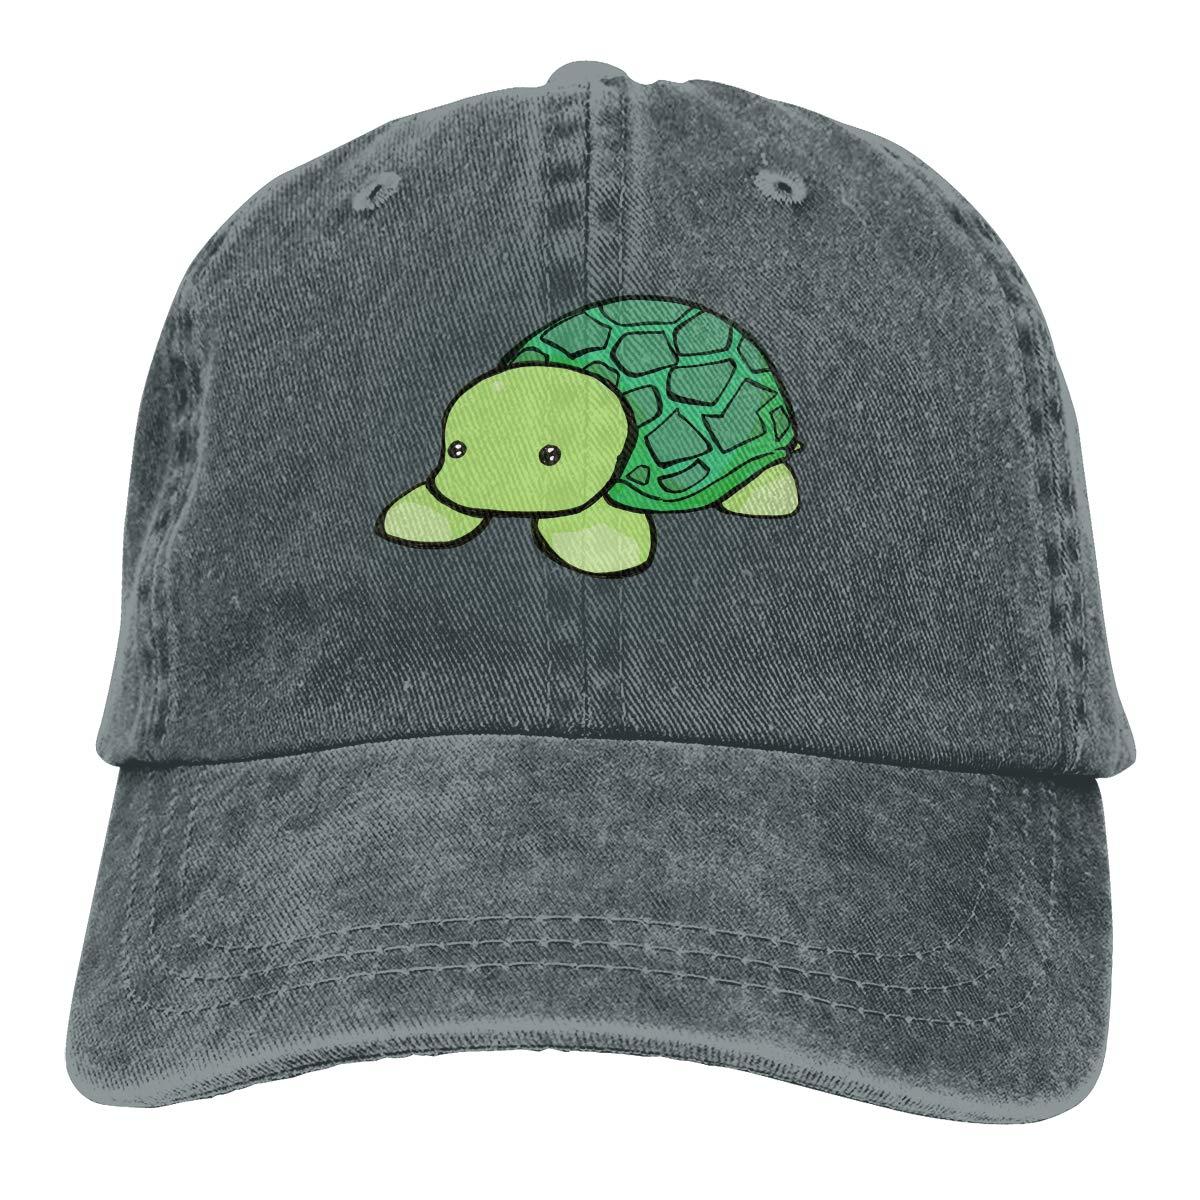 Turtle Smiling Cotton Denim Adult Unisex Jeans Cap Adjustable Hat Back Off Im Retired